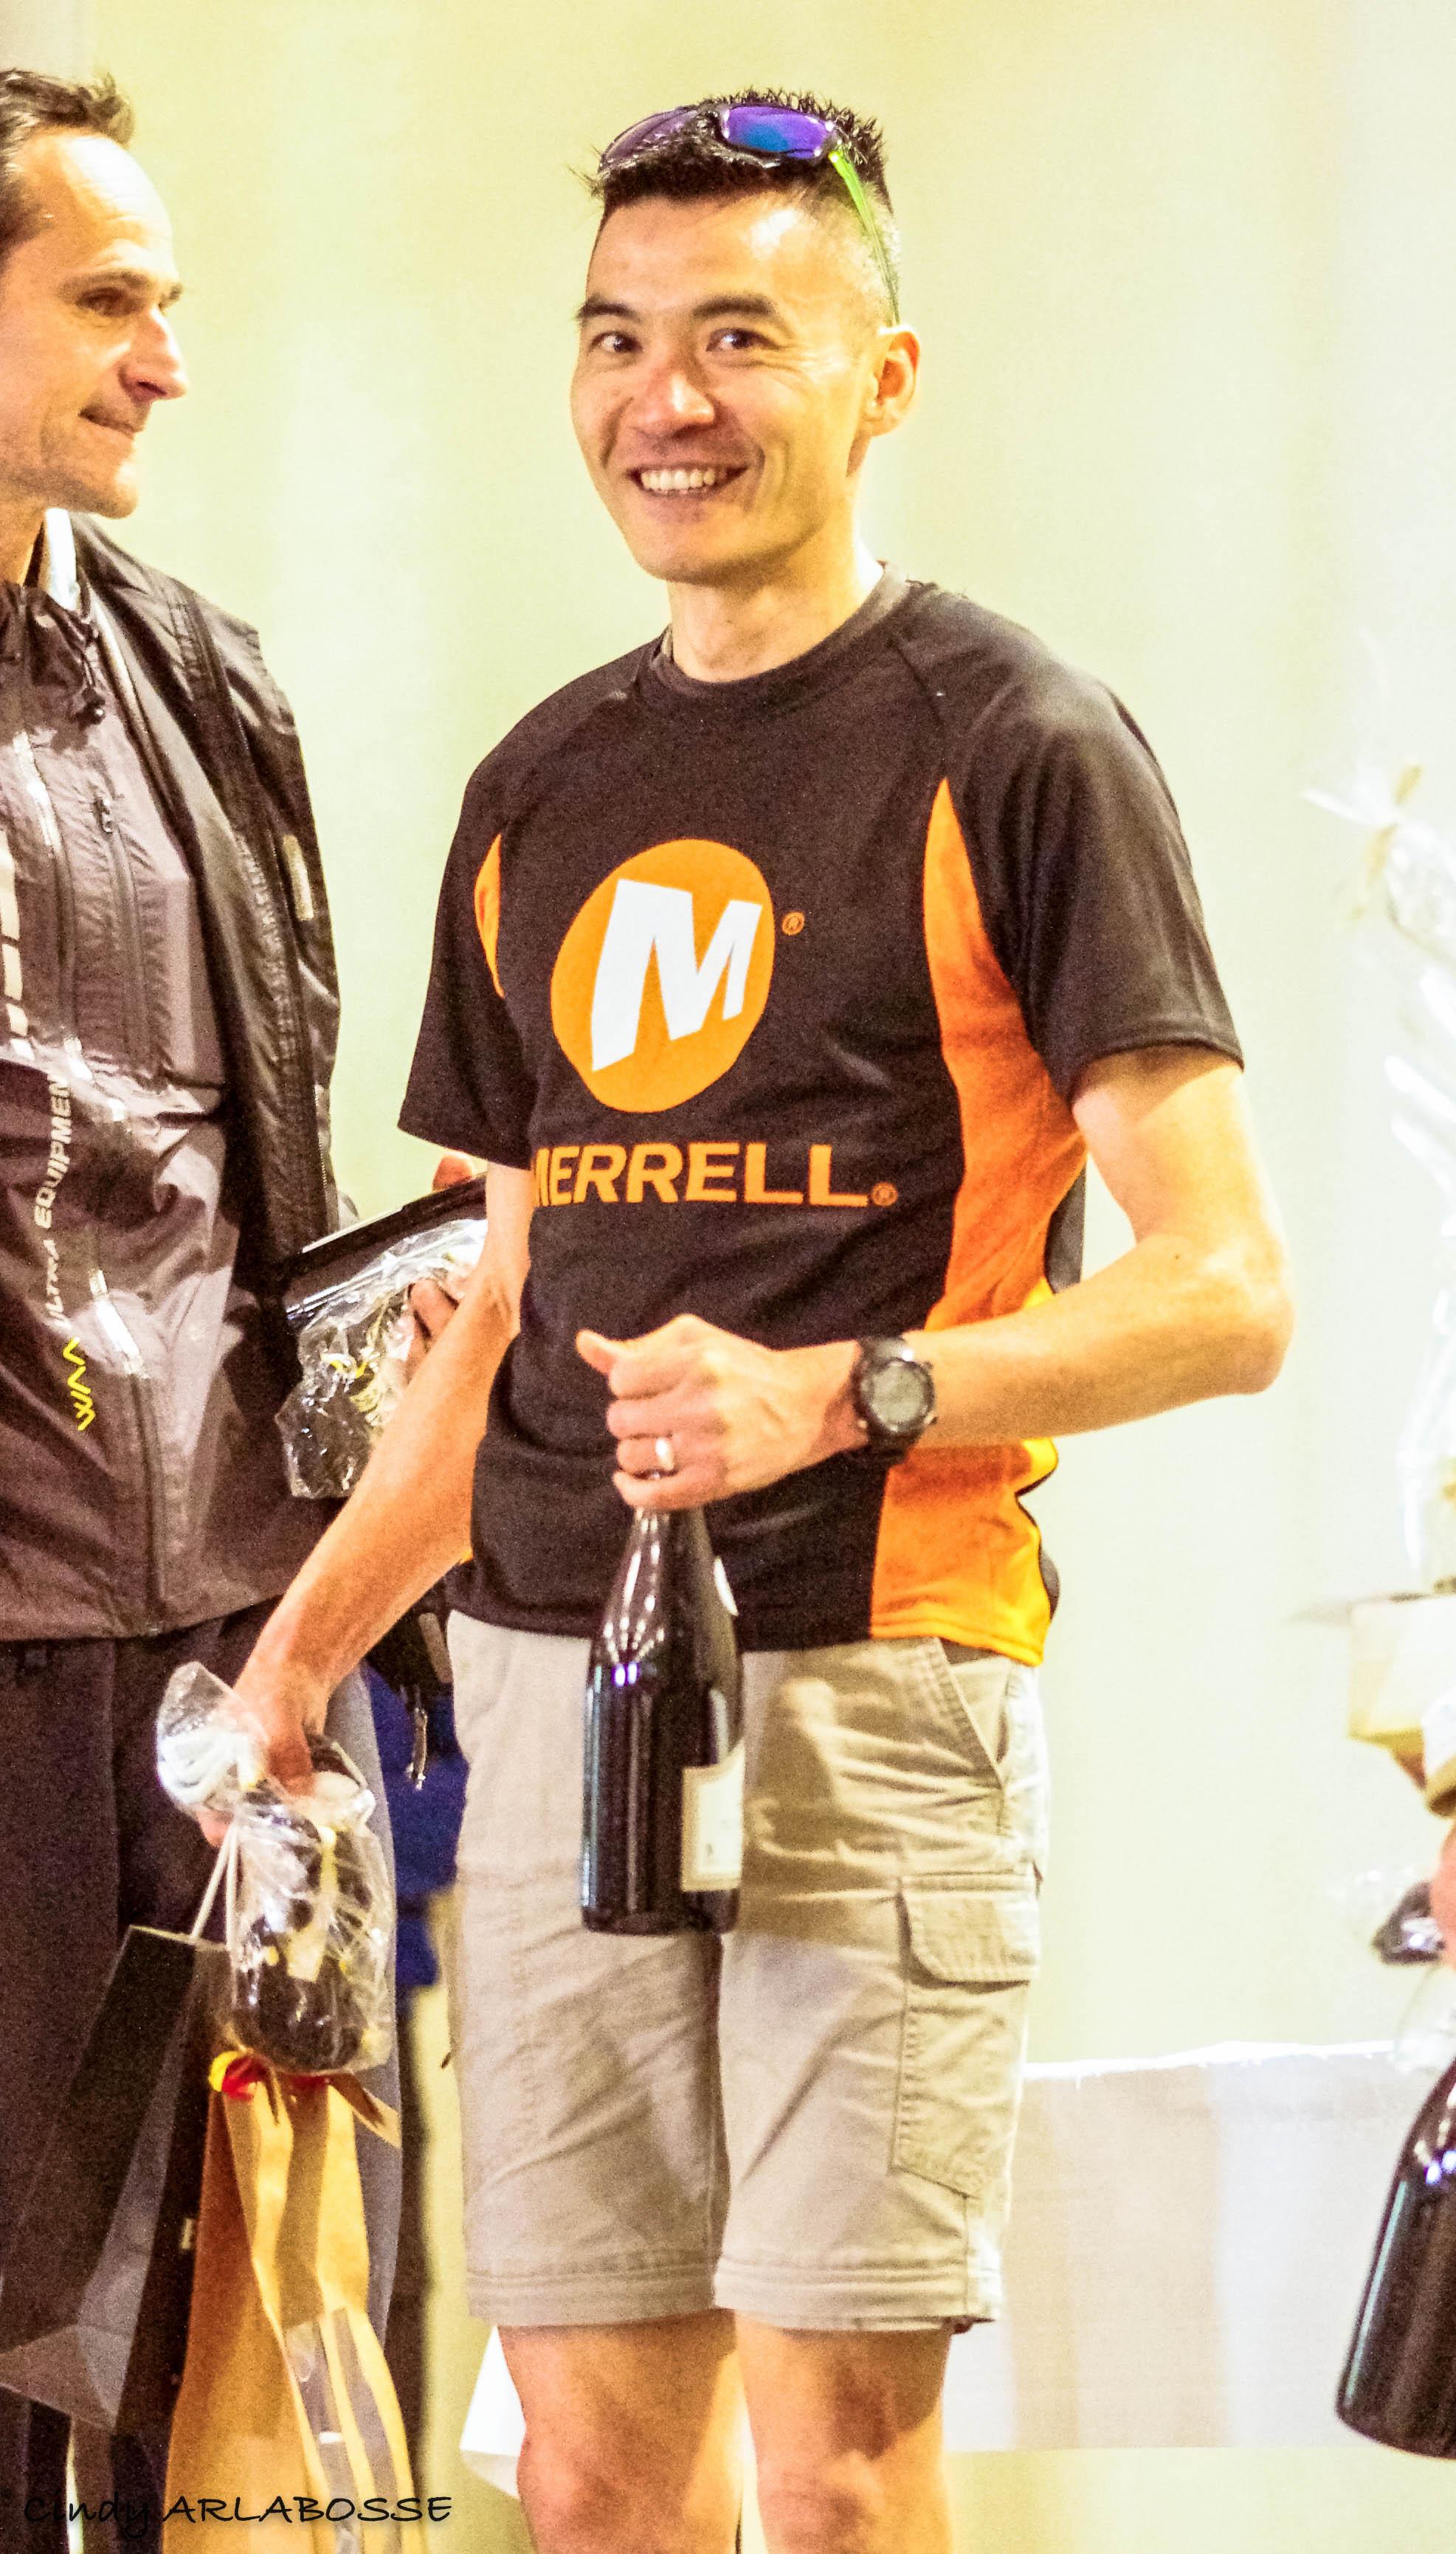 Merell-8.jpg